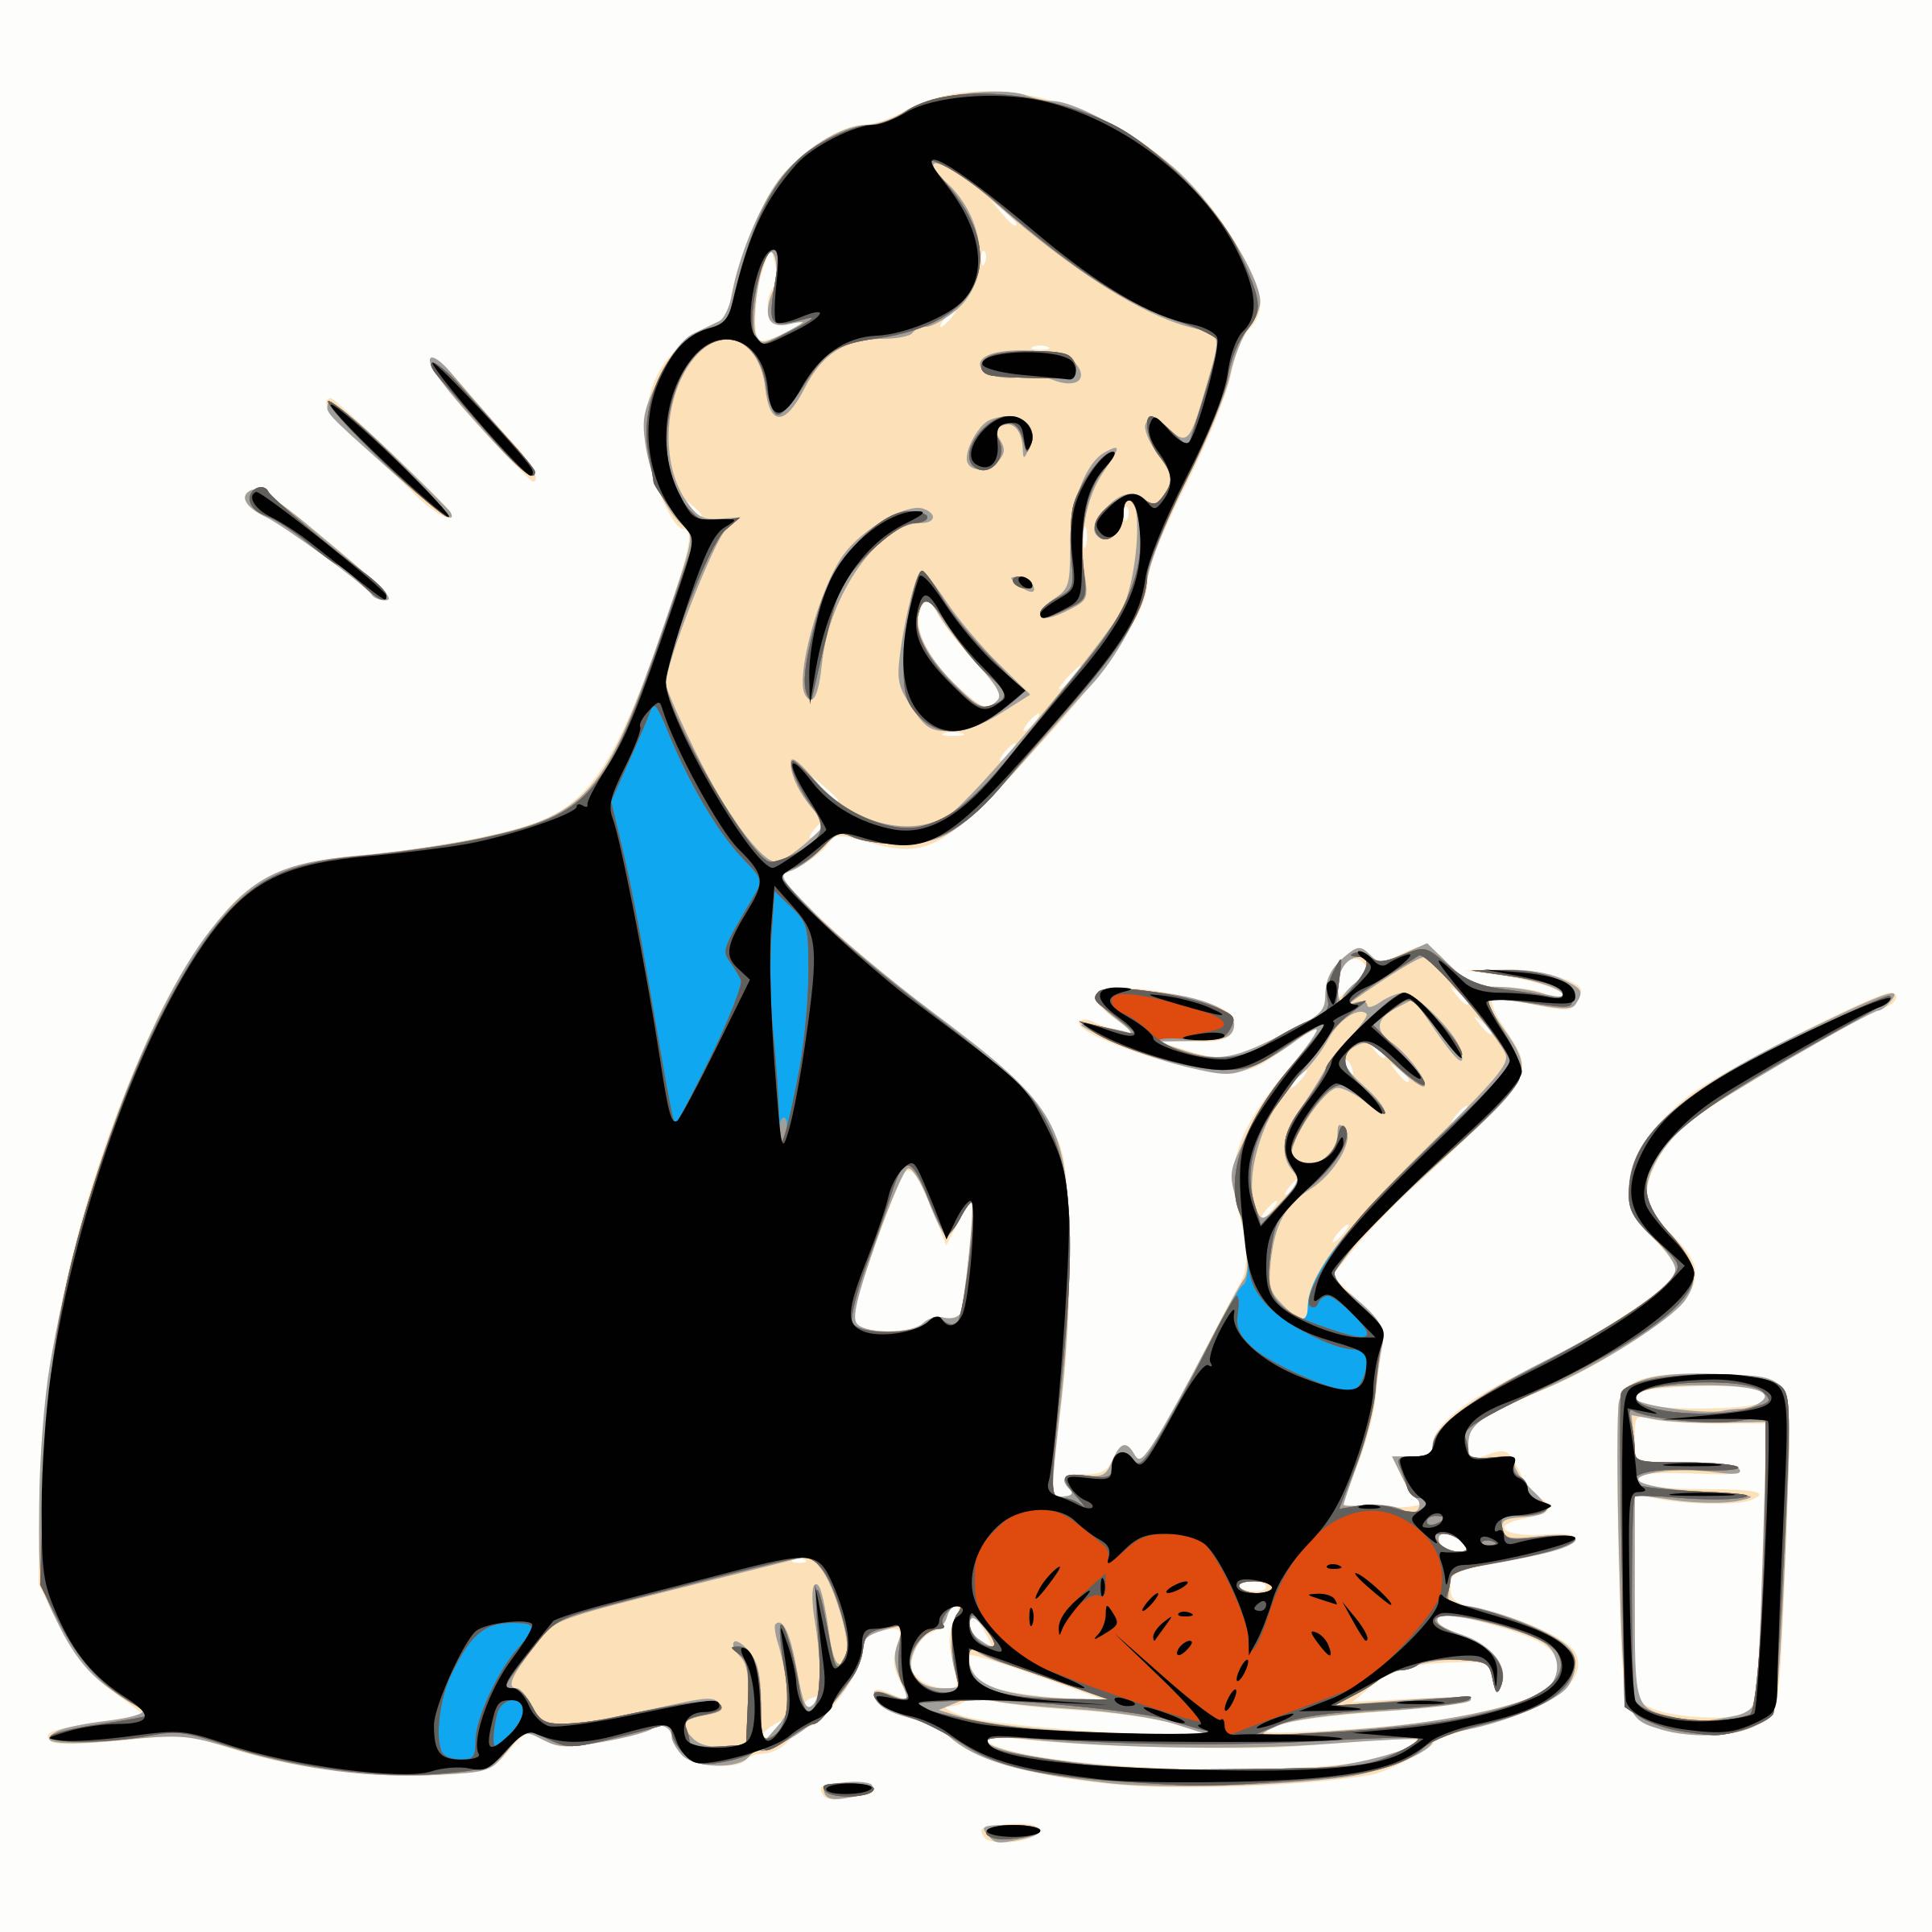 2400x2400 Clipartman Eating Fiery Food